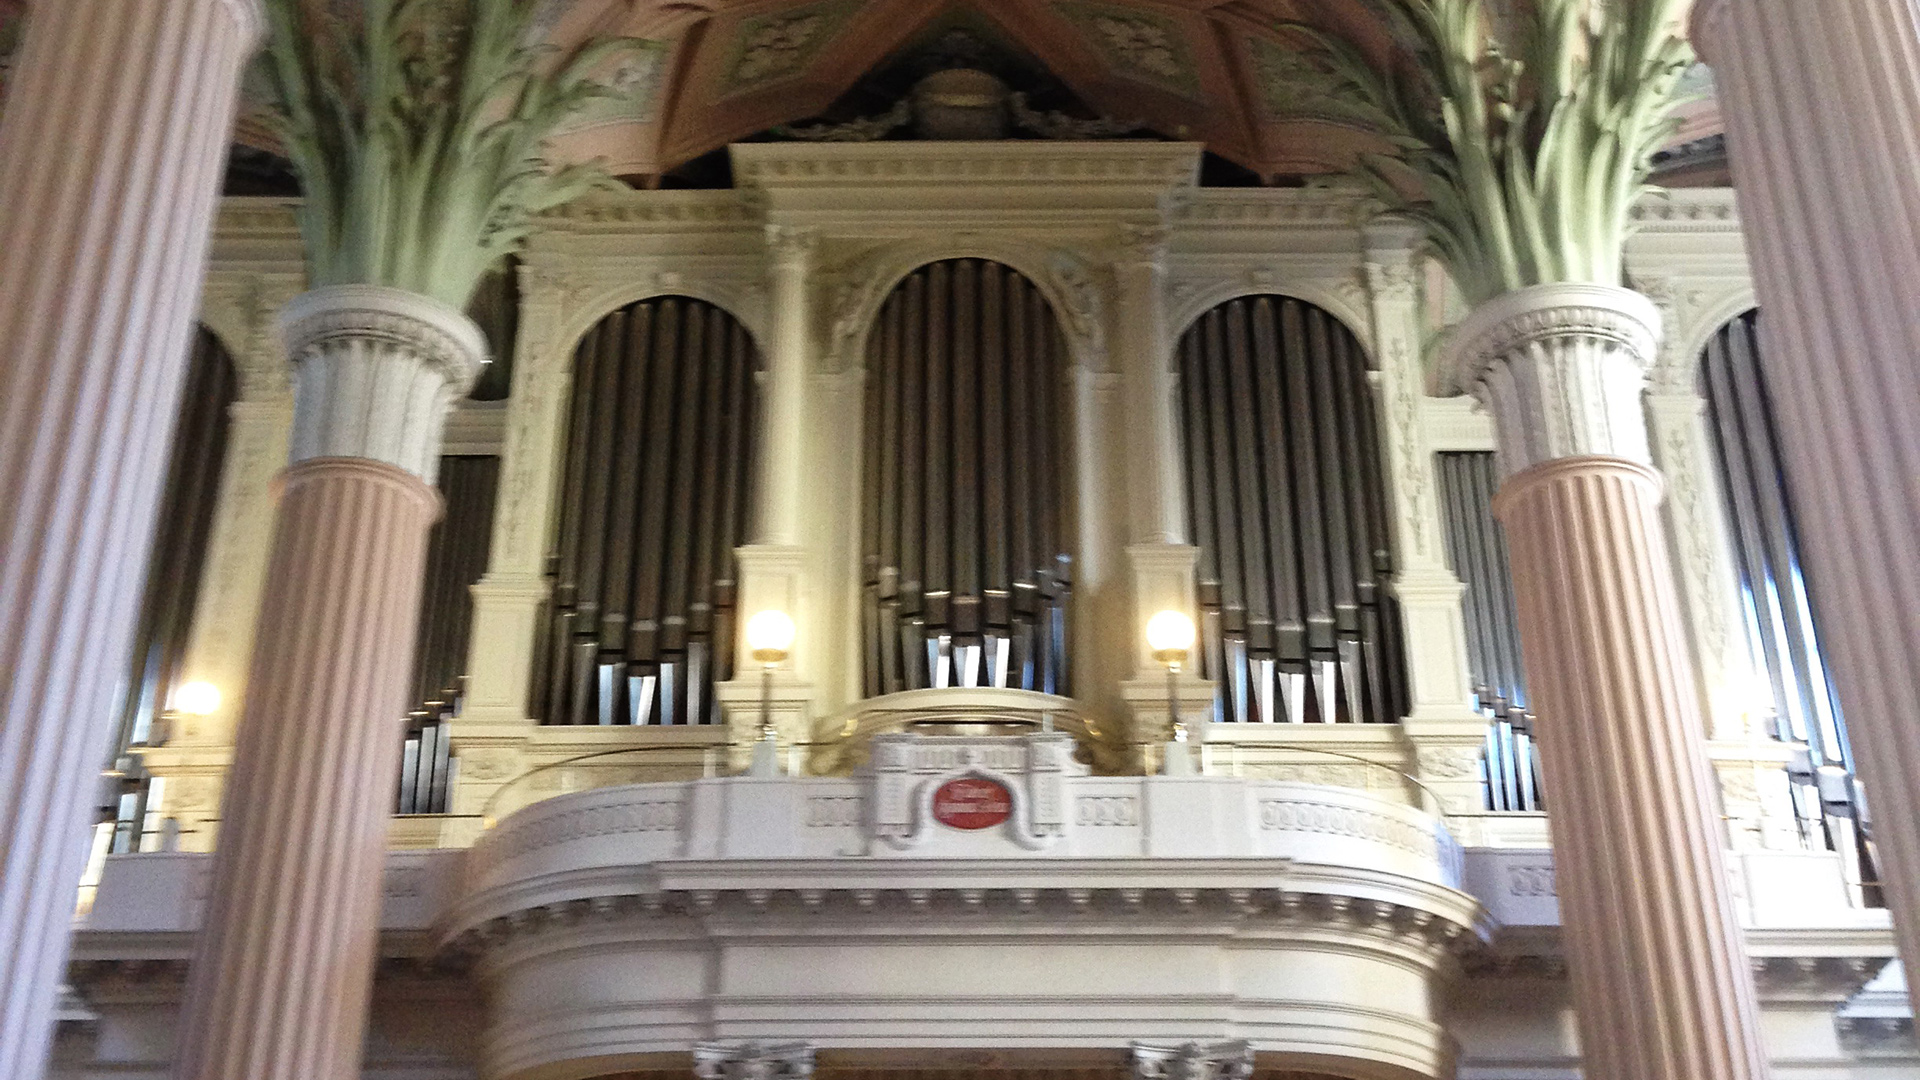 THE JOHANN SEBASTIAN BACH JOURNEY – A MUSICAL PILGRIMAGE – July 2015